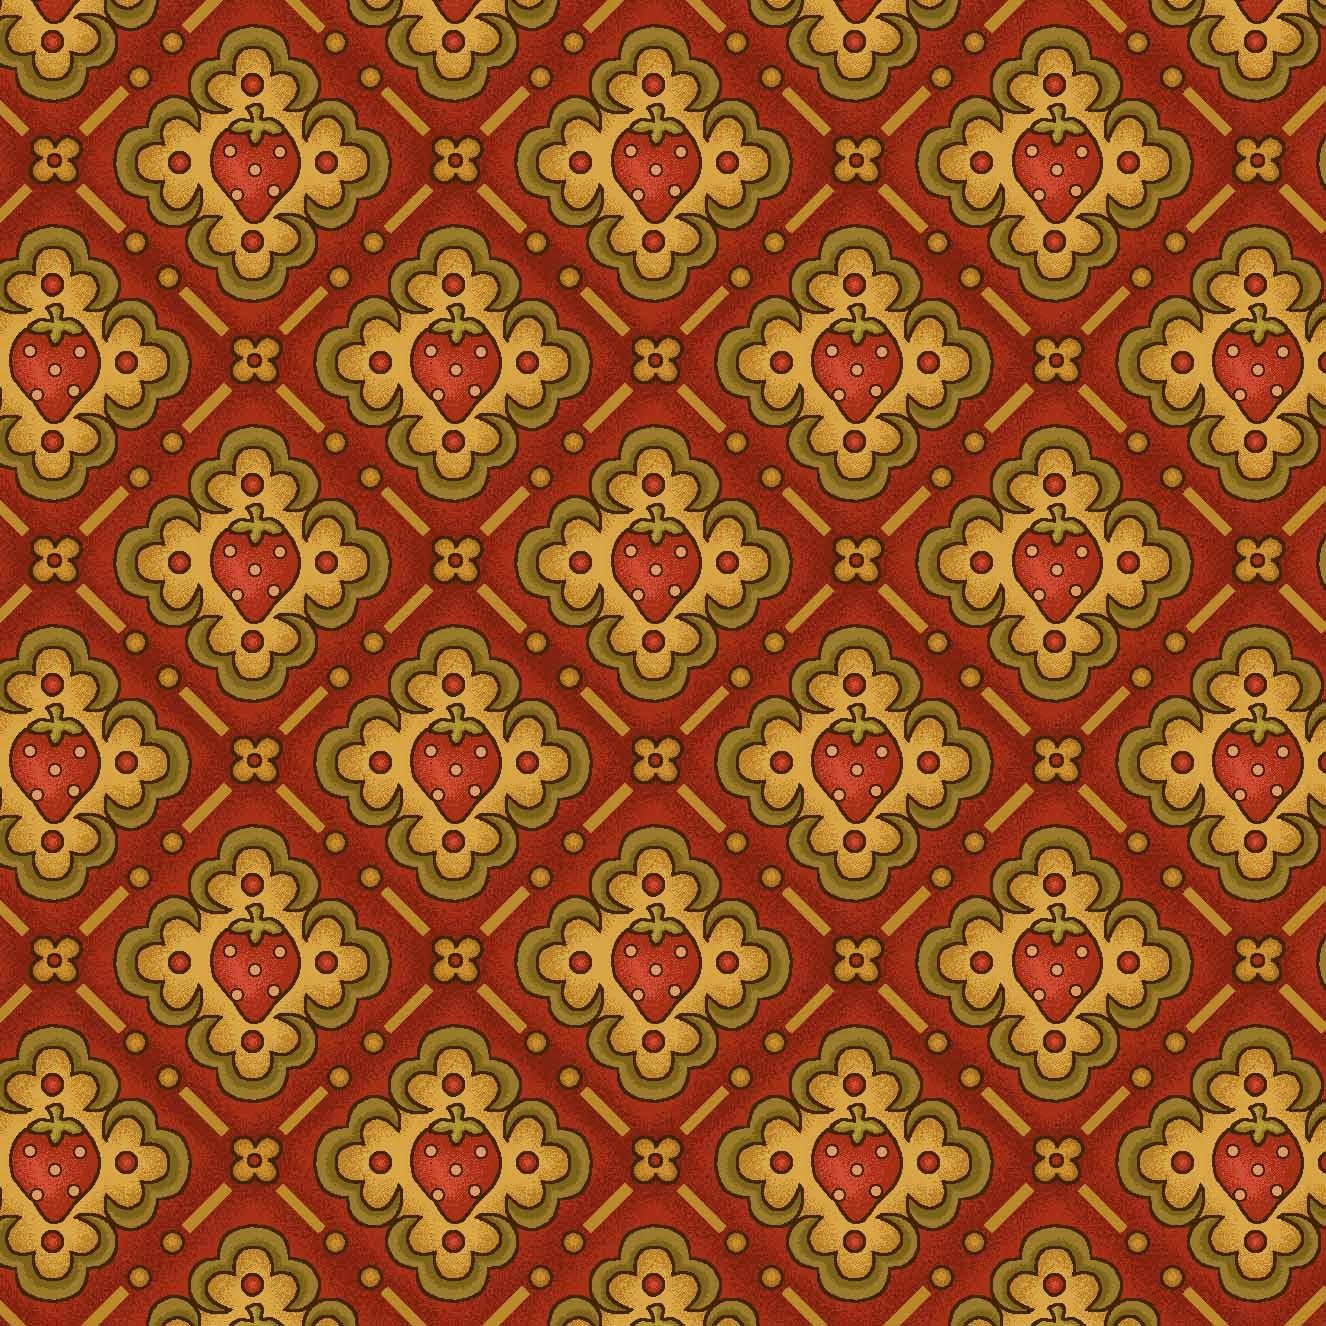 http://www.henryglassfabrics.com/collection/sentimental-stitches/